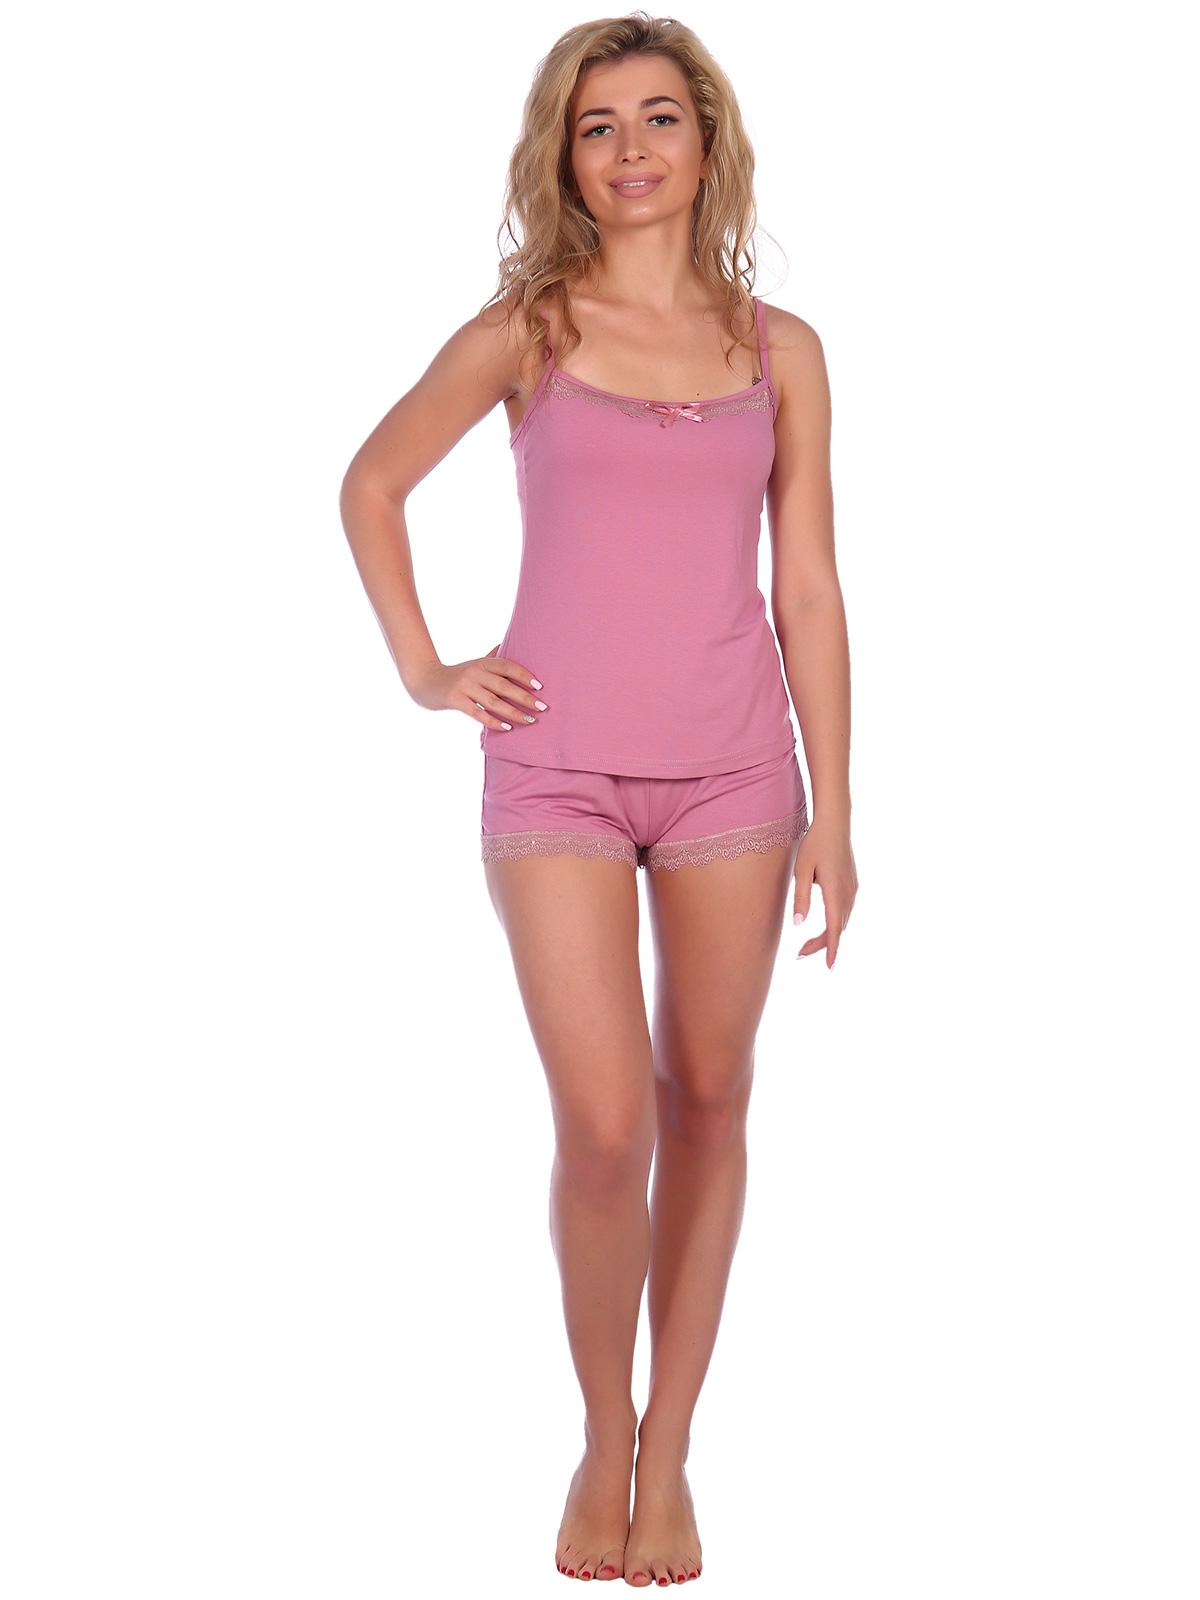 Жен. пижама арт. 16-0573 Розовый р. 52 НСД Трикотаж